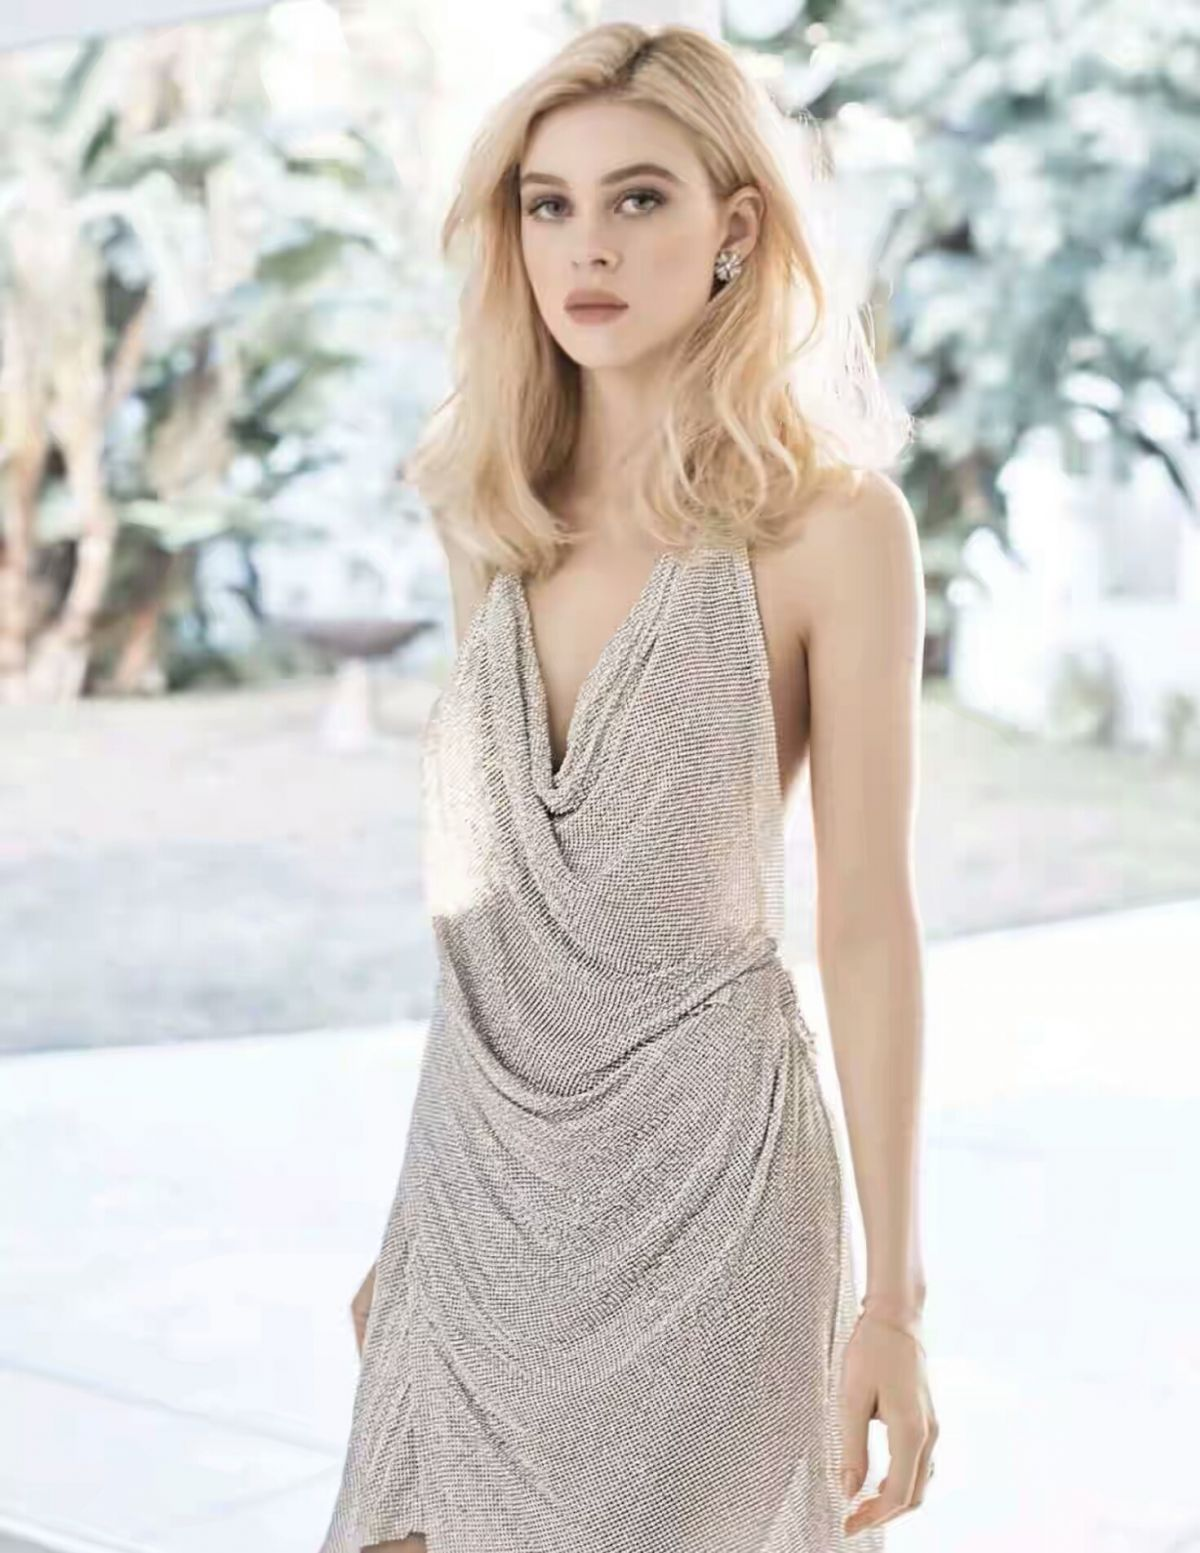 NICOLA PELTZ in Vogue Magazine, Spain February 2017 Issue ...